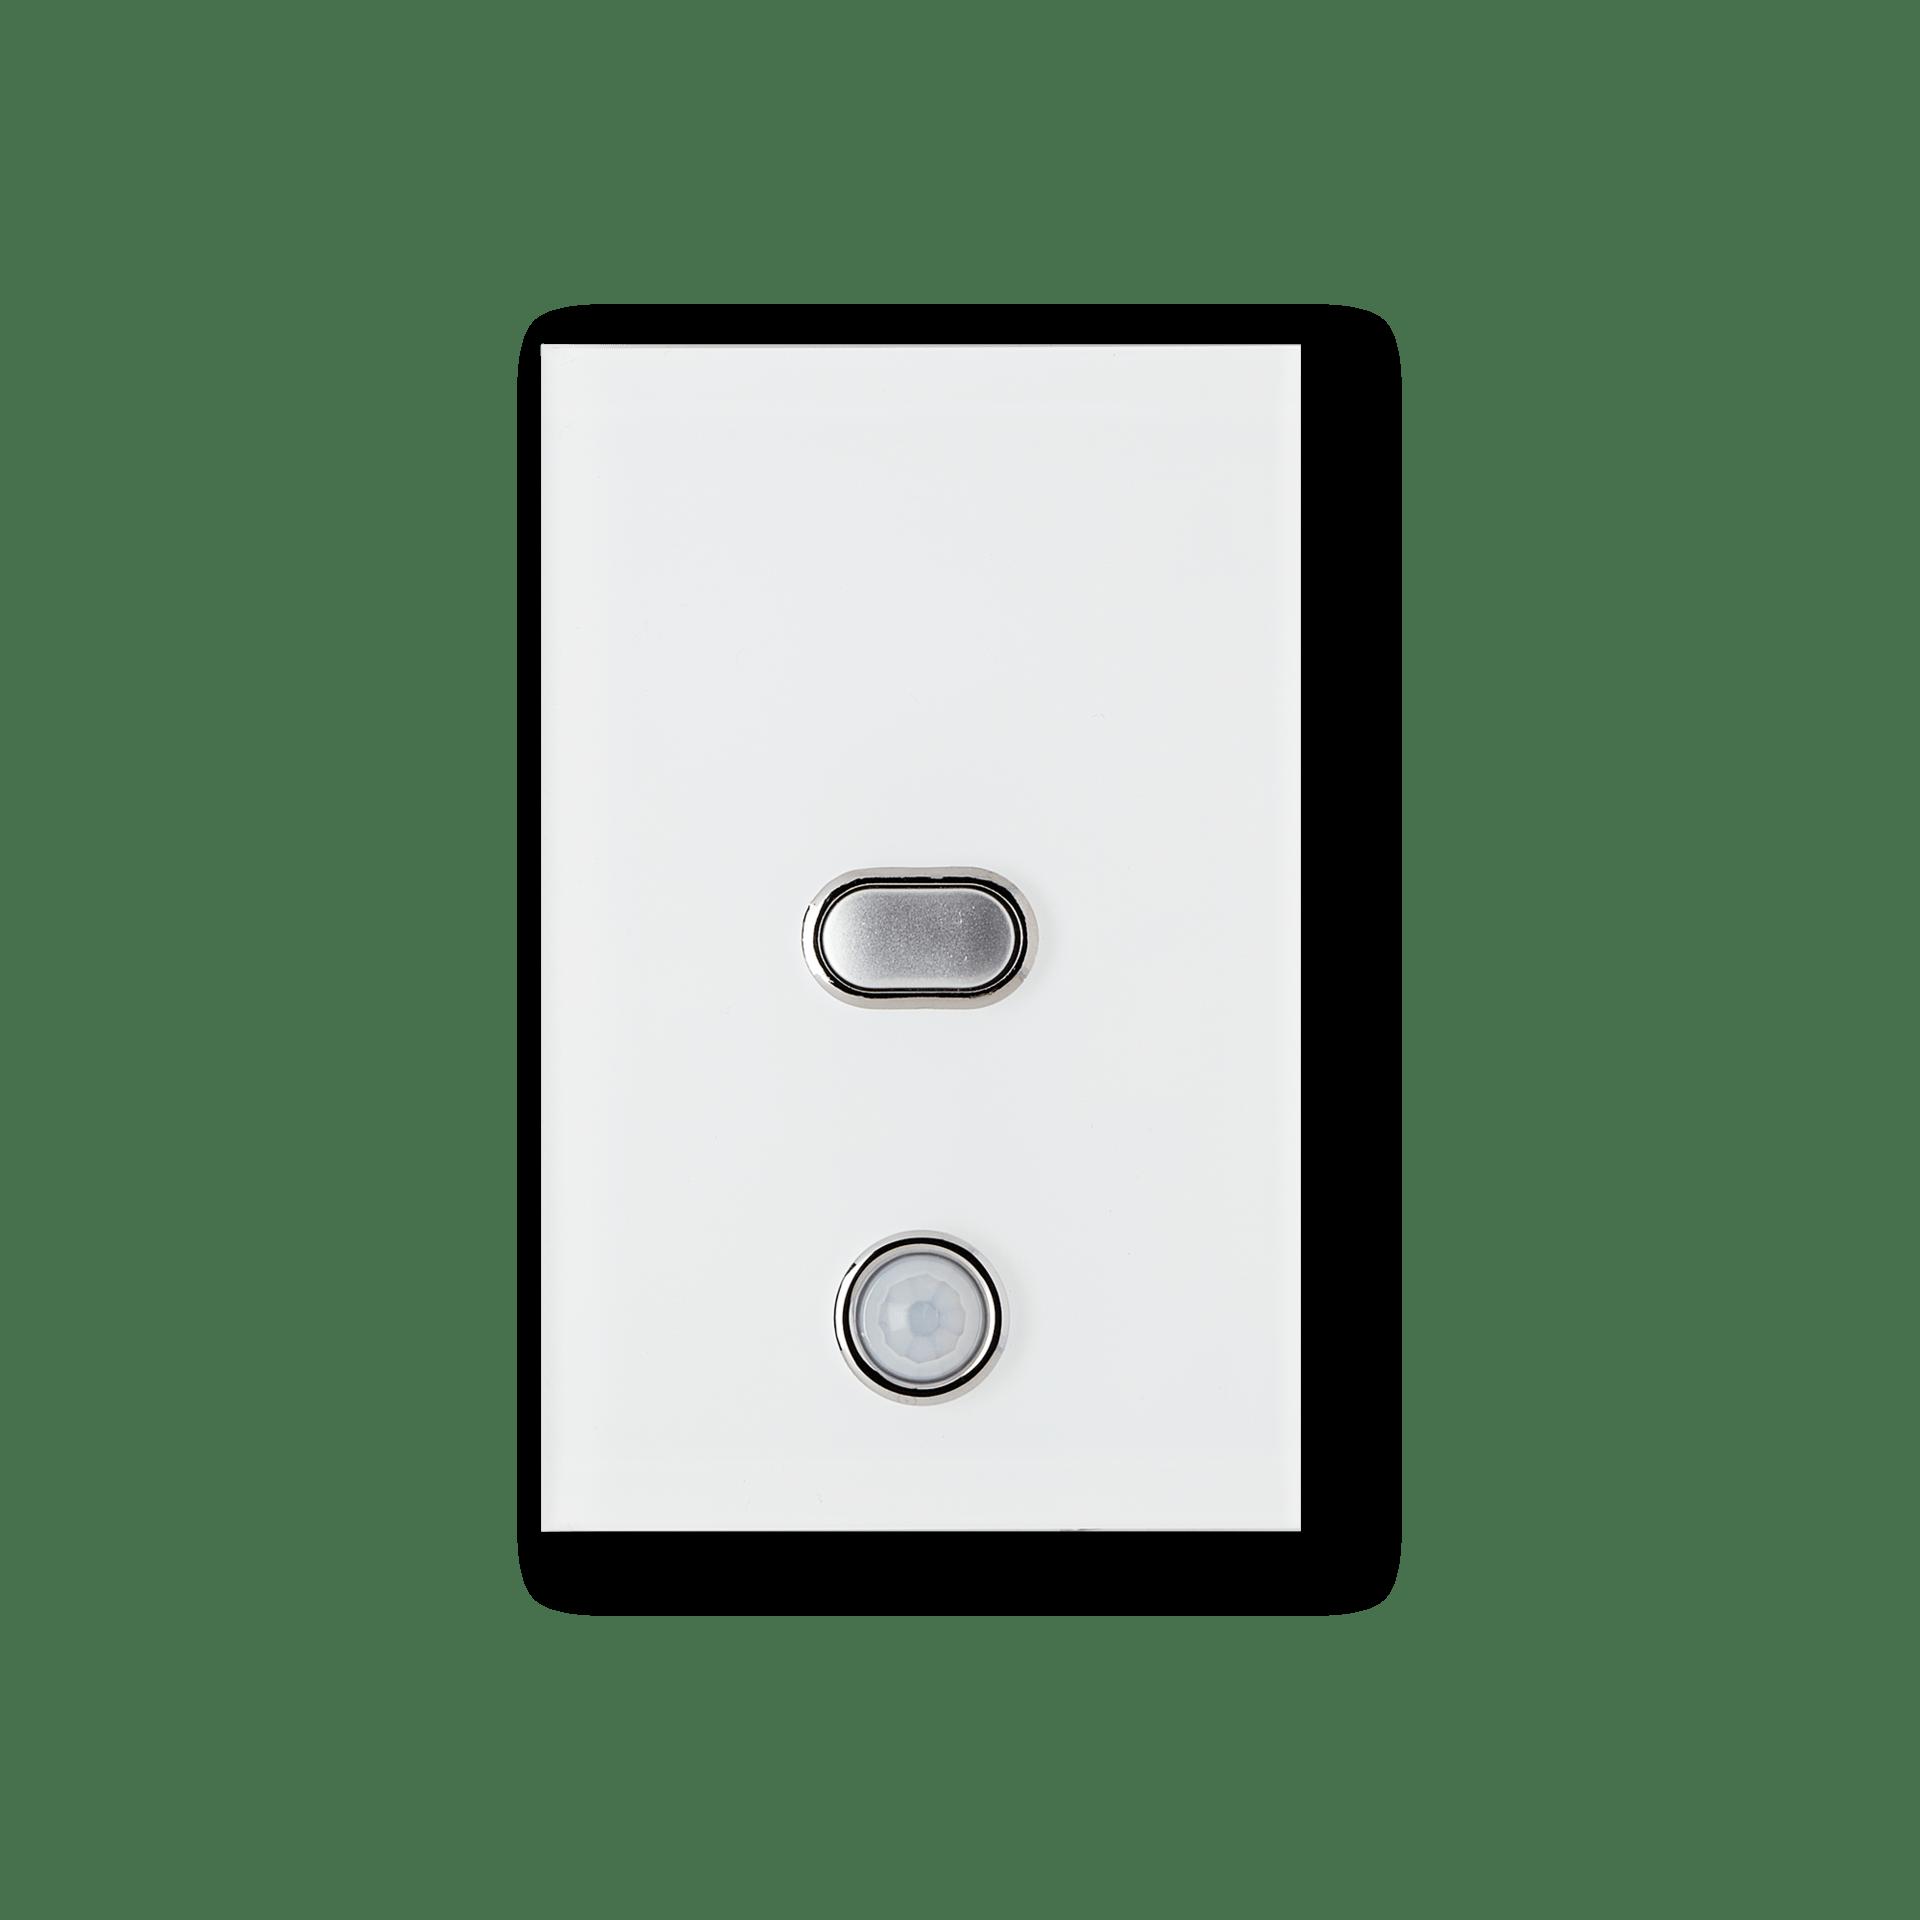 Single White Sensor